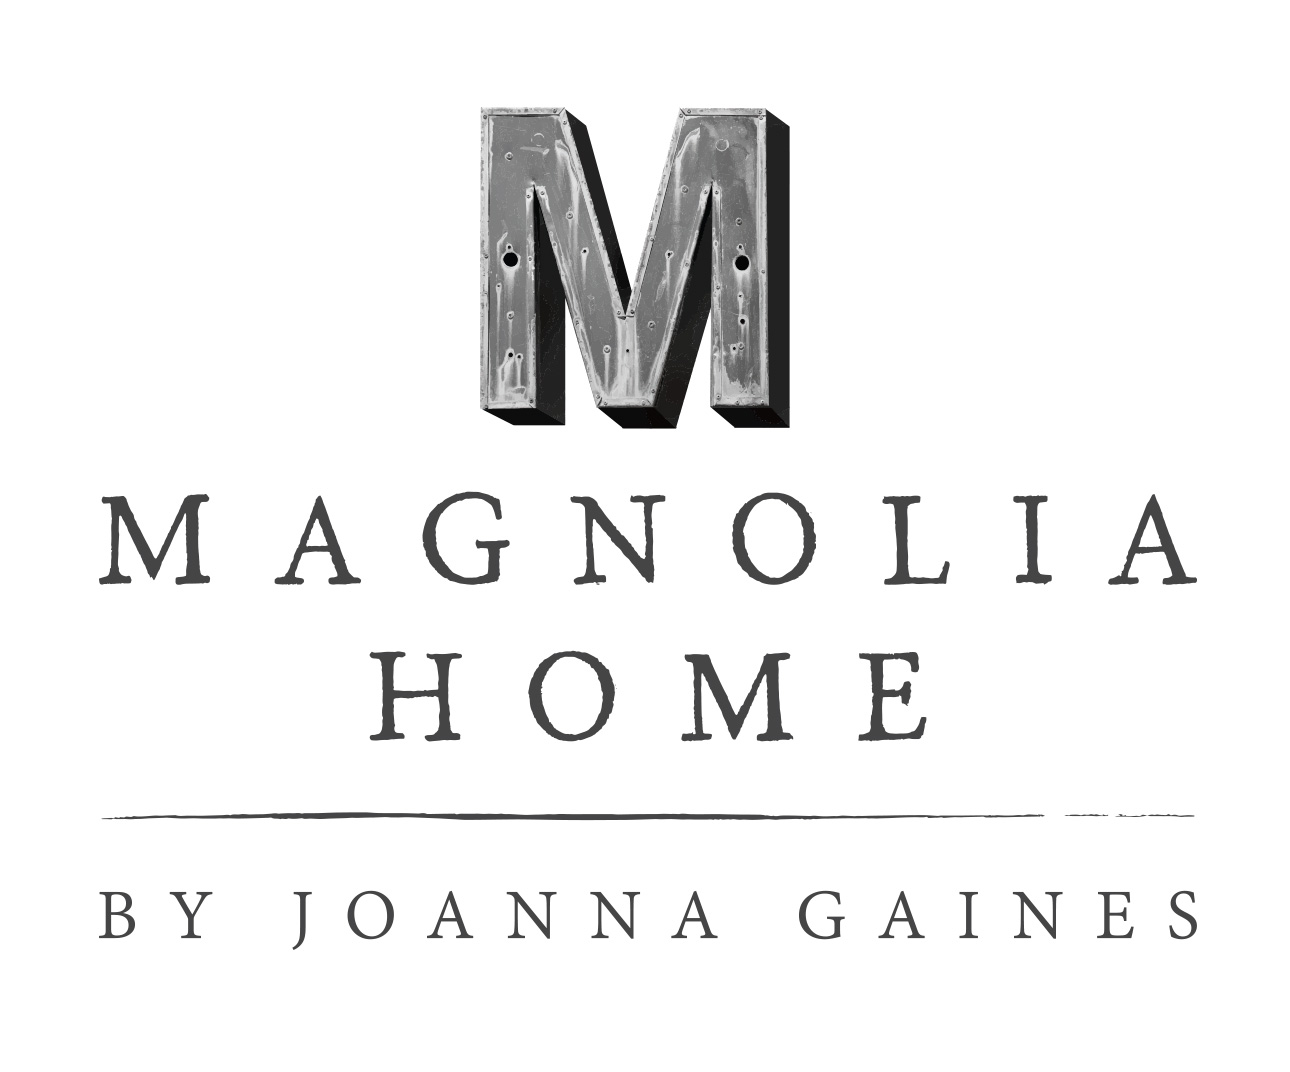 Magnolia Home Fixer Upper Joanna Gaines